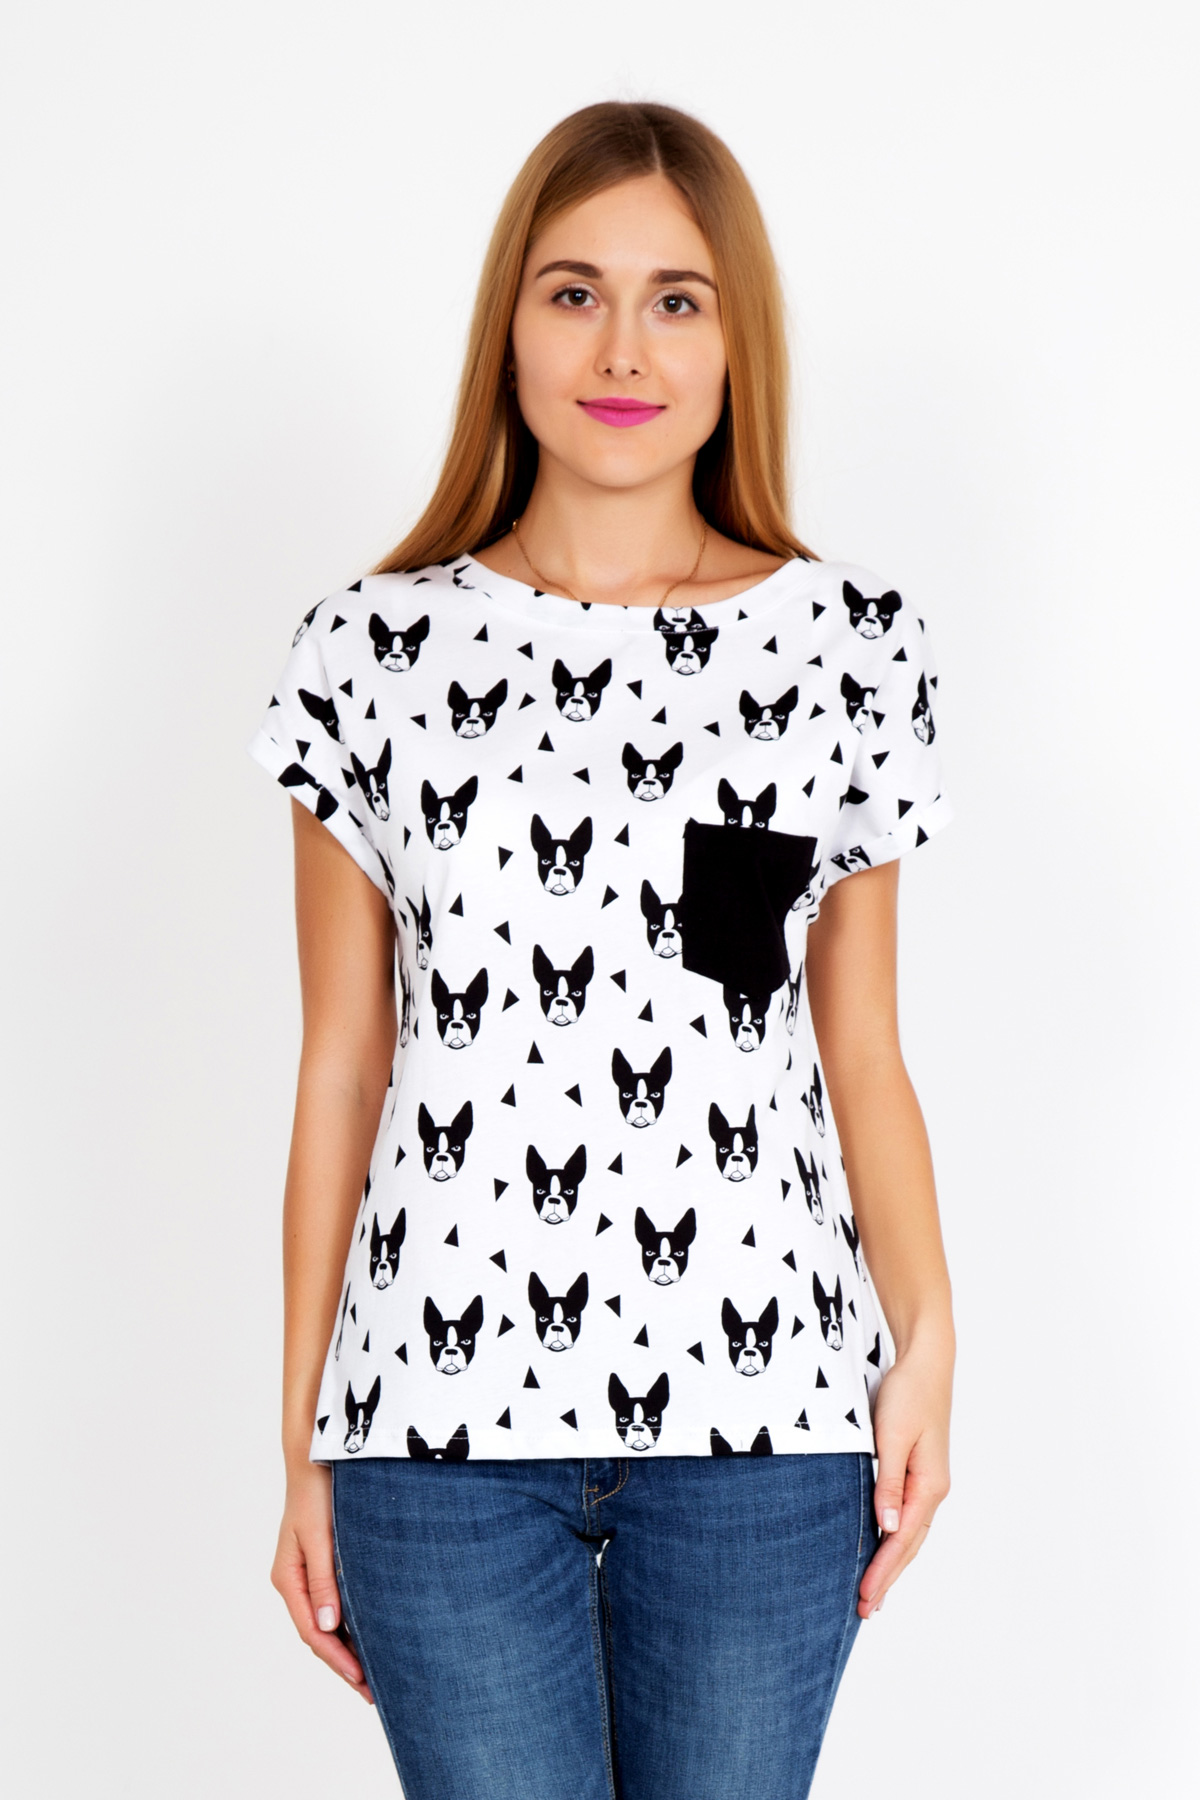 Жен. футболка Dog р. 50Майки и футболки<br>Факт. ОГ: 106 см <br>Факт. ОТ: 104 см <br>Факт. ОБ: 108 см <br>Длина по спинке: 64 см<br><br>Тип: Жен. футболка<br>Размер: 50<br>Материал: Кулирка